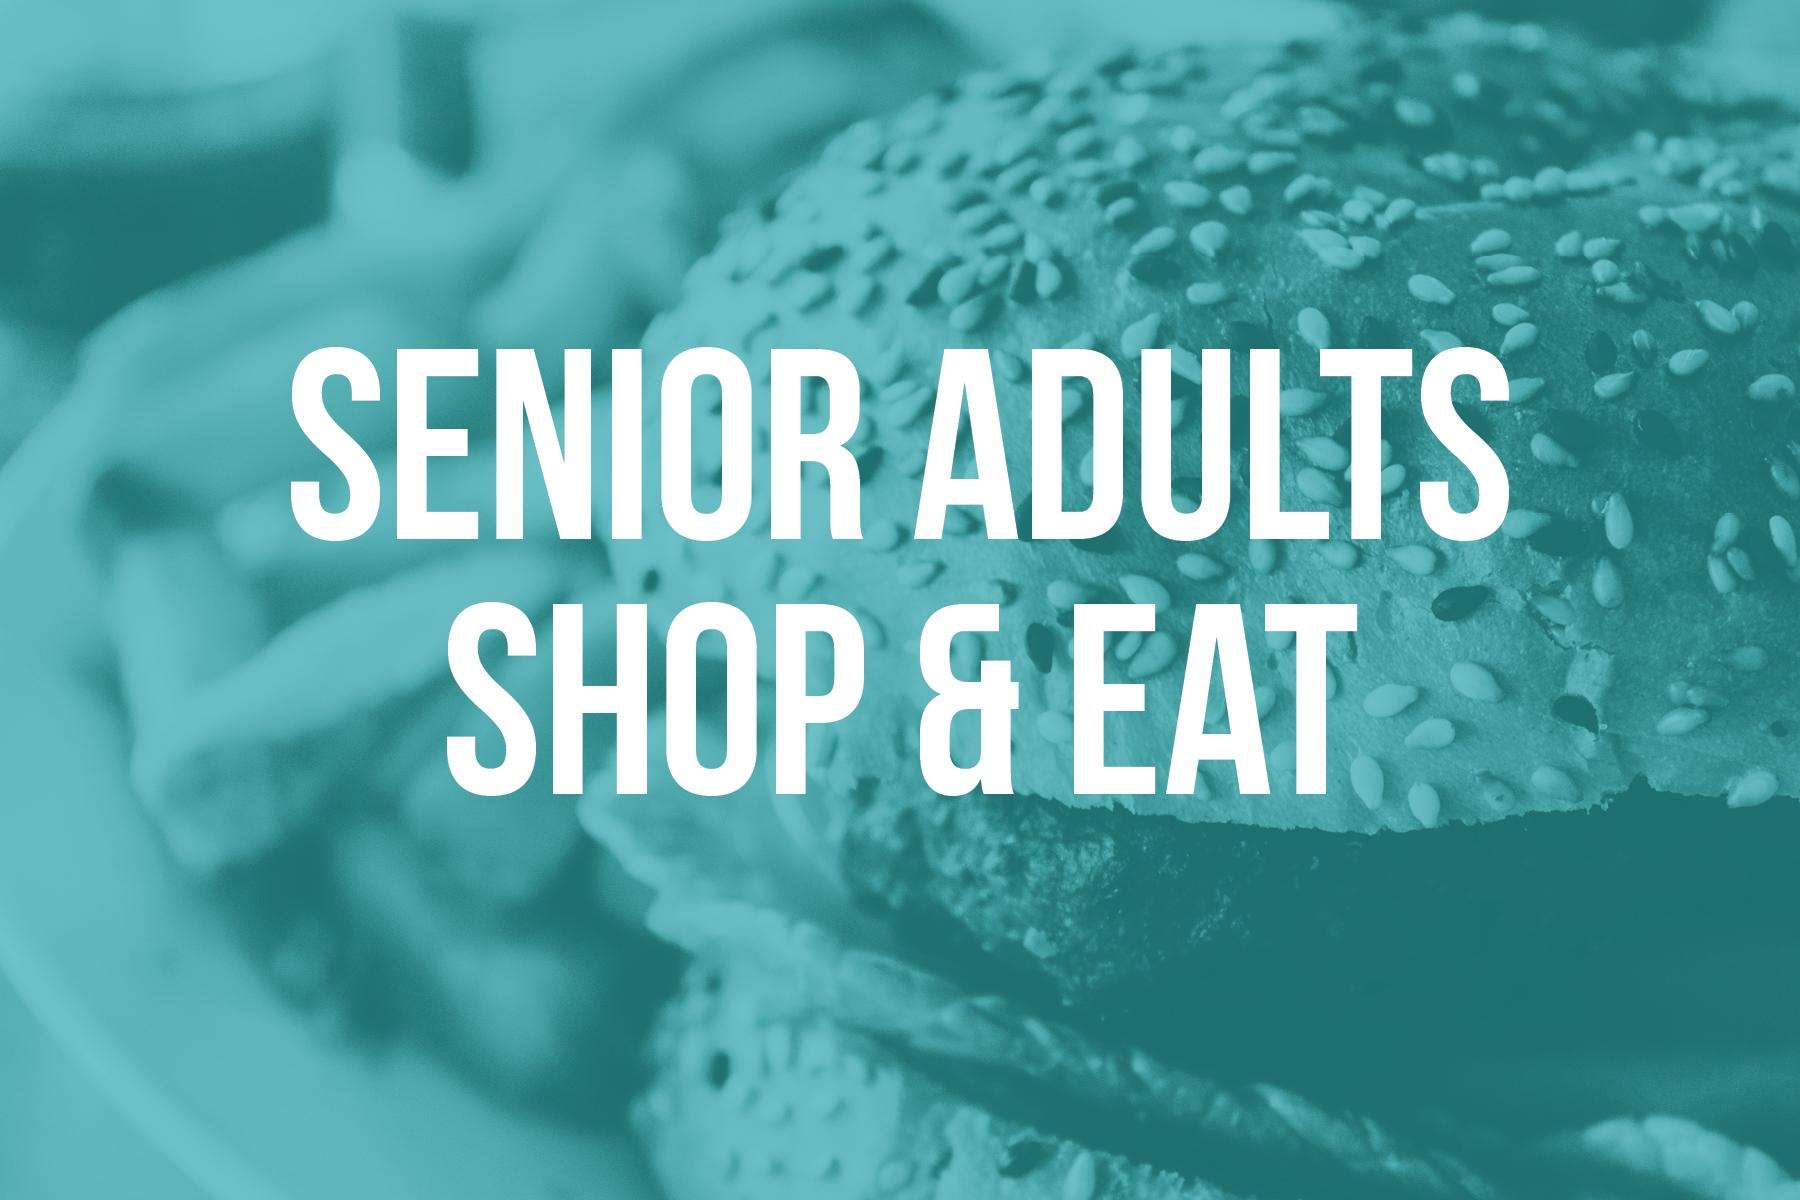 senior adults shop and eat.jpg